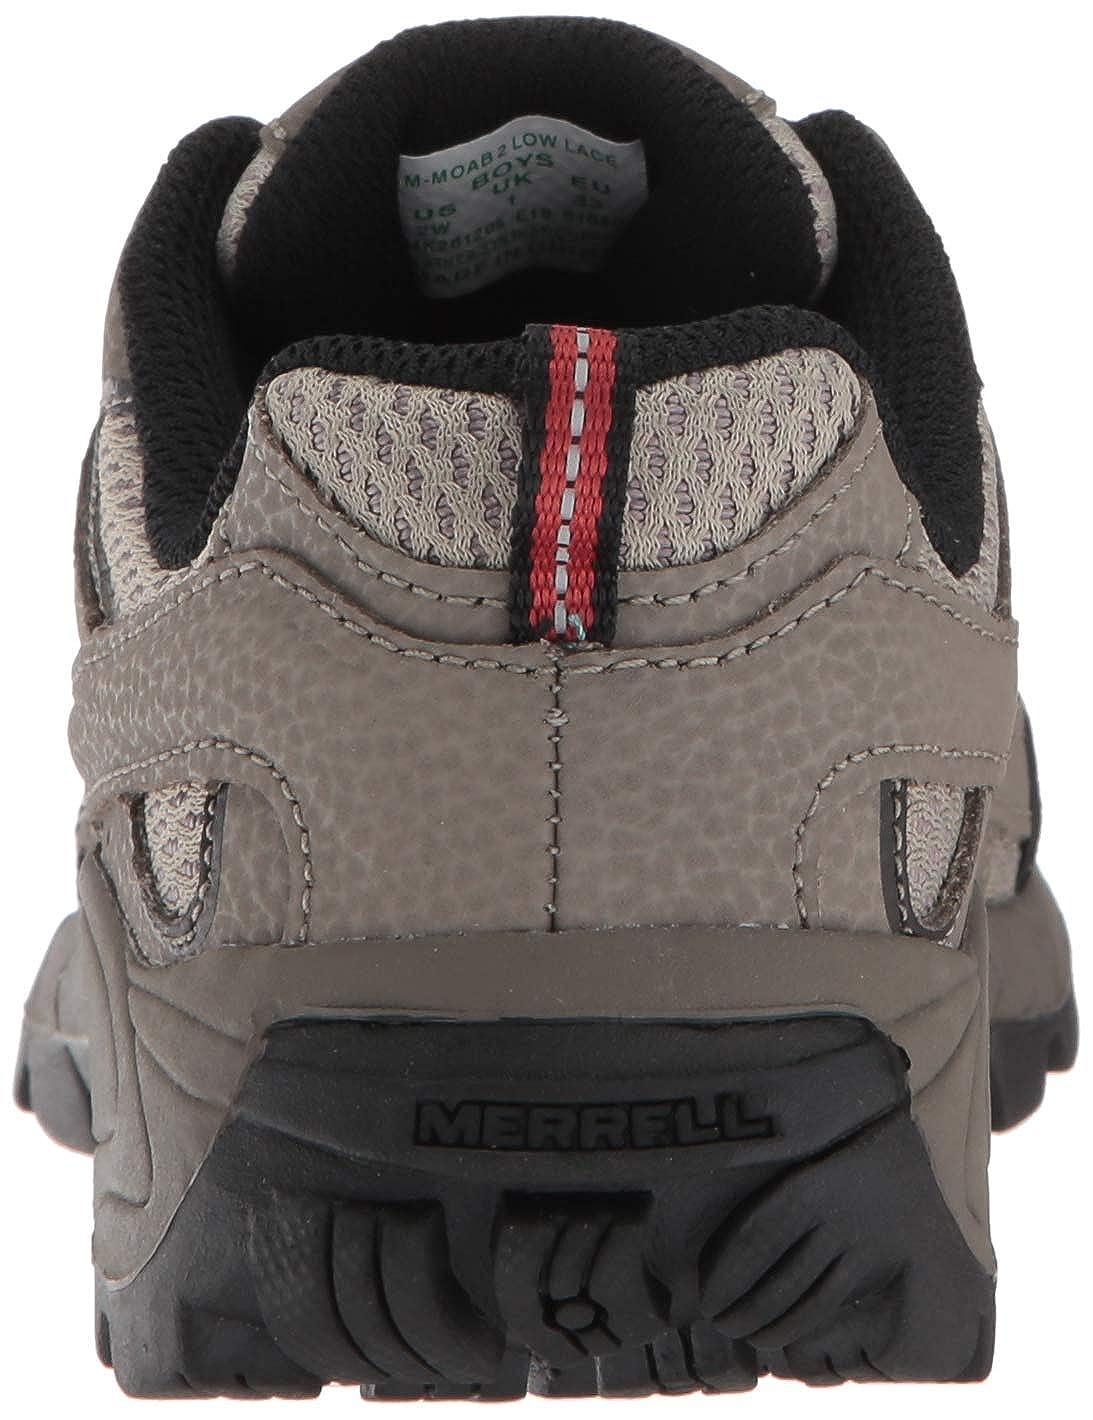 Merrell Moab 2 Low Lace Shoe MK261205